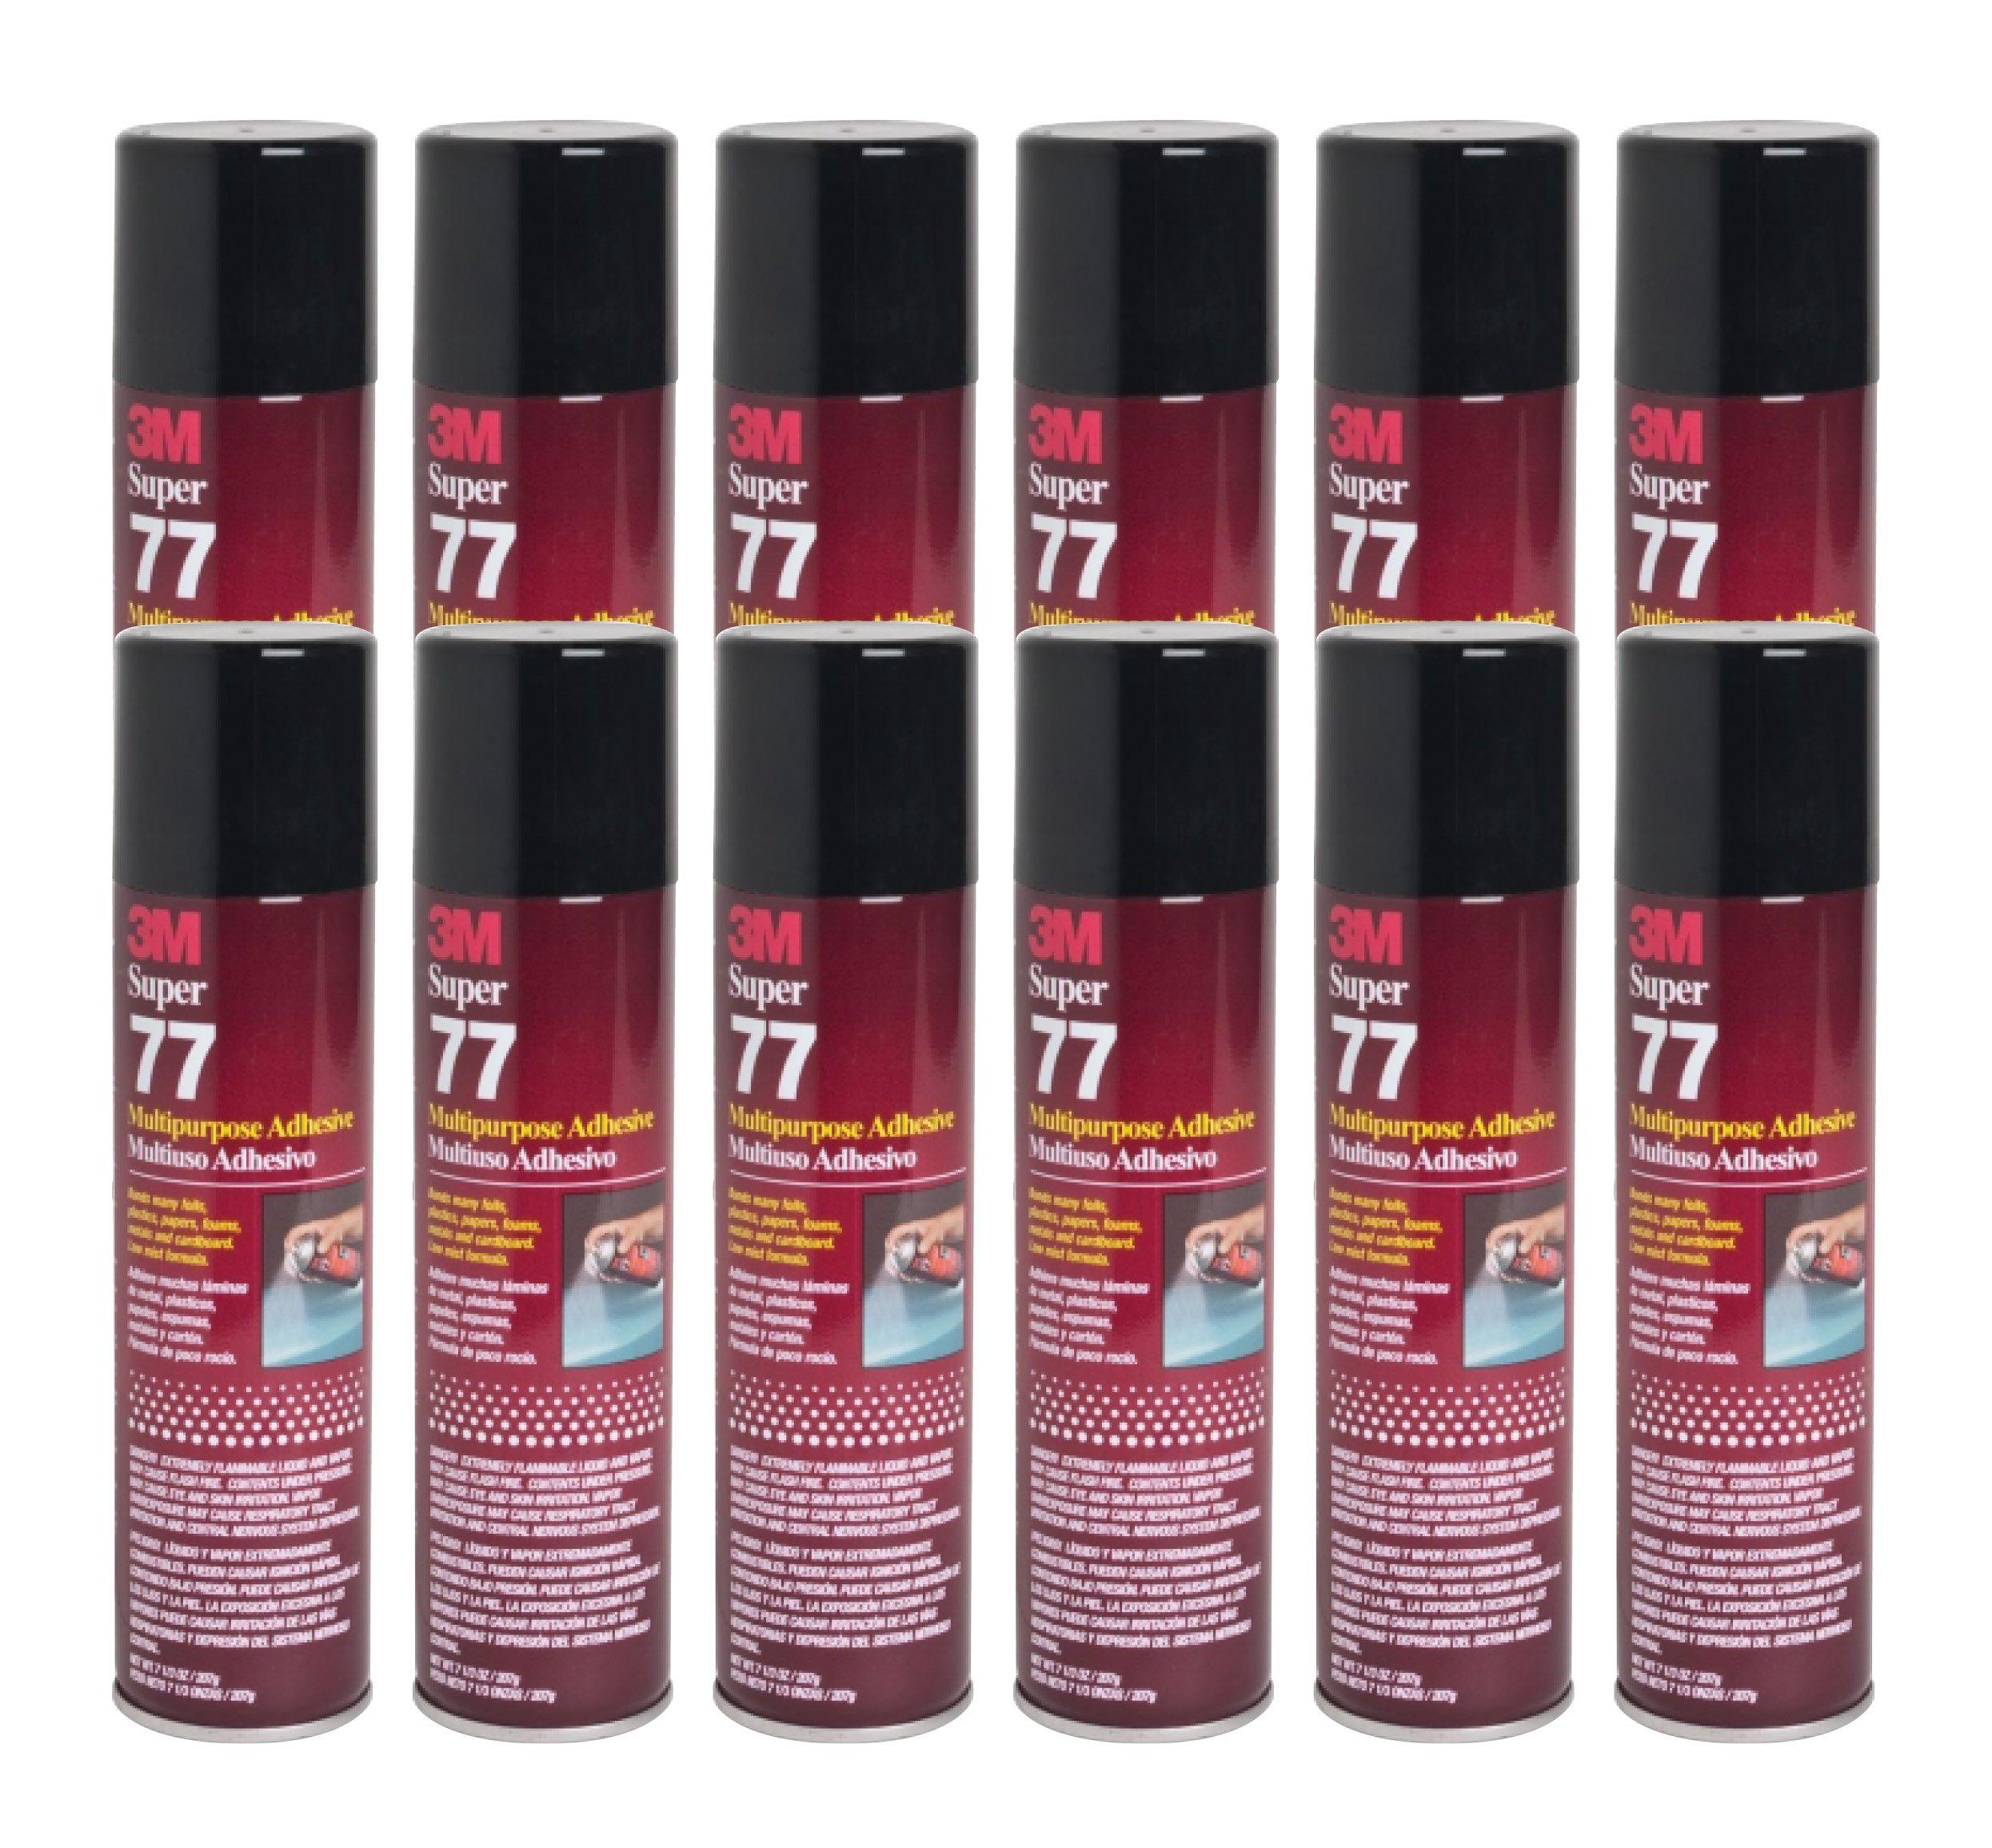 QTY12 3M SUPER 77 7.3 OZ SPRAY GLUE MULTIPURPOSE ADHESIVE CANS